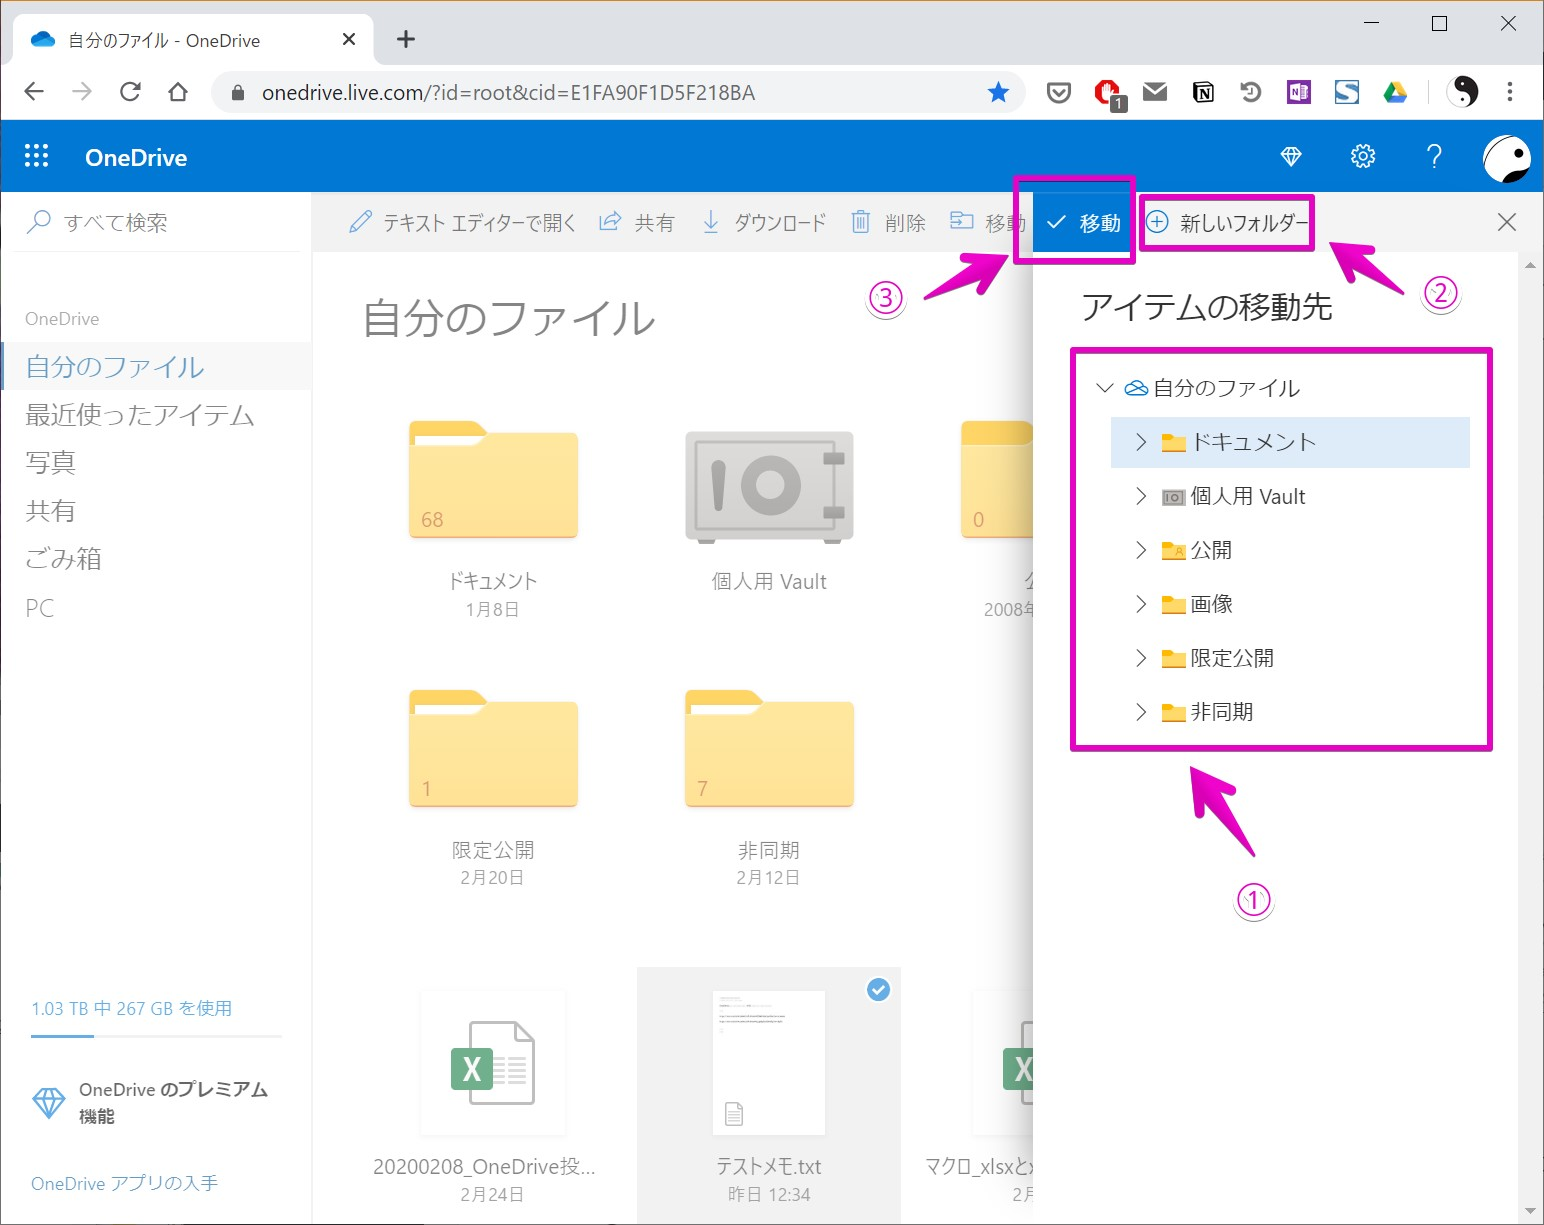 WEB画面でOneDriveのフォルダー/ファイルを移動する